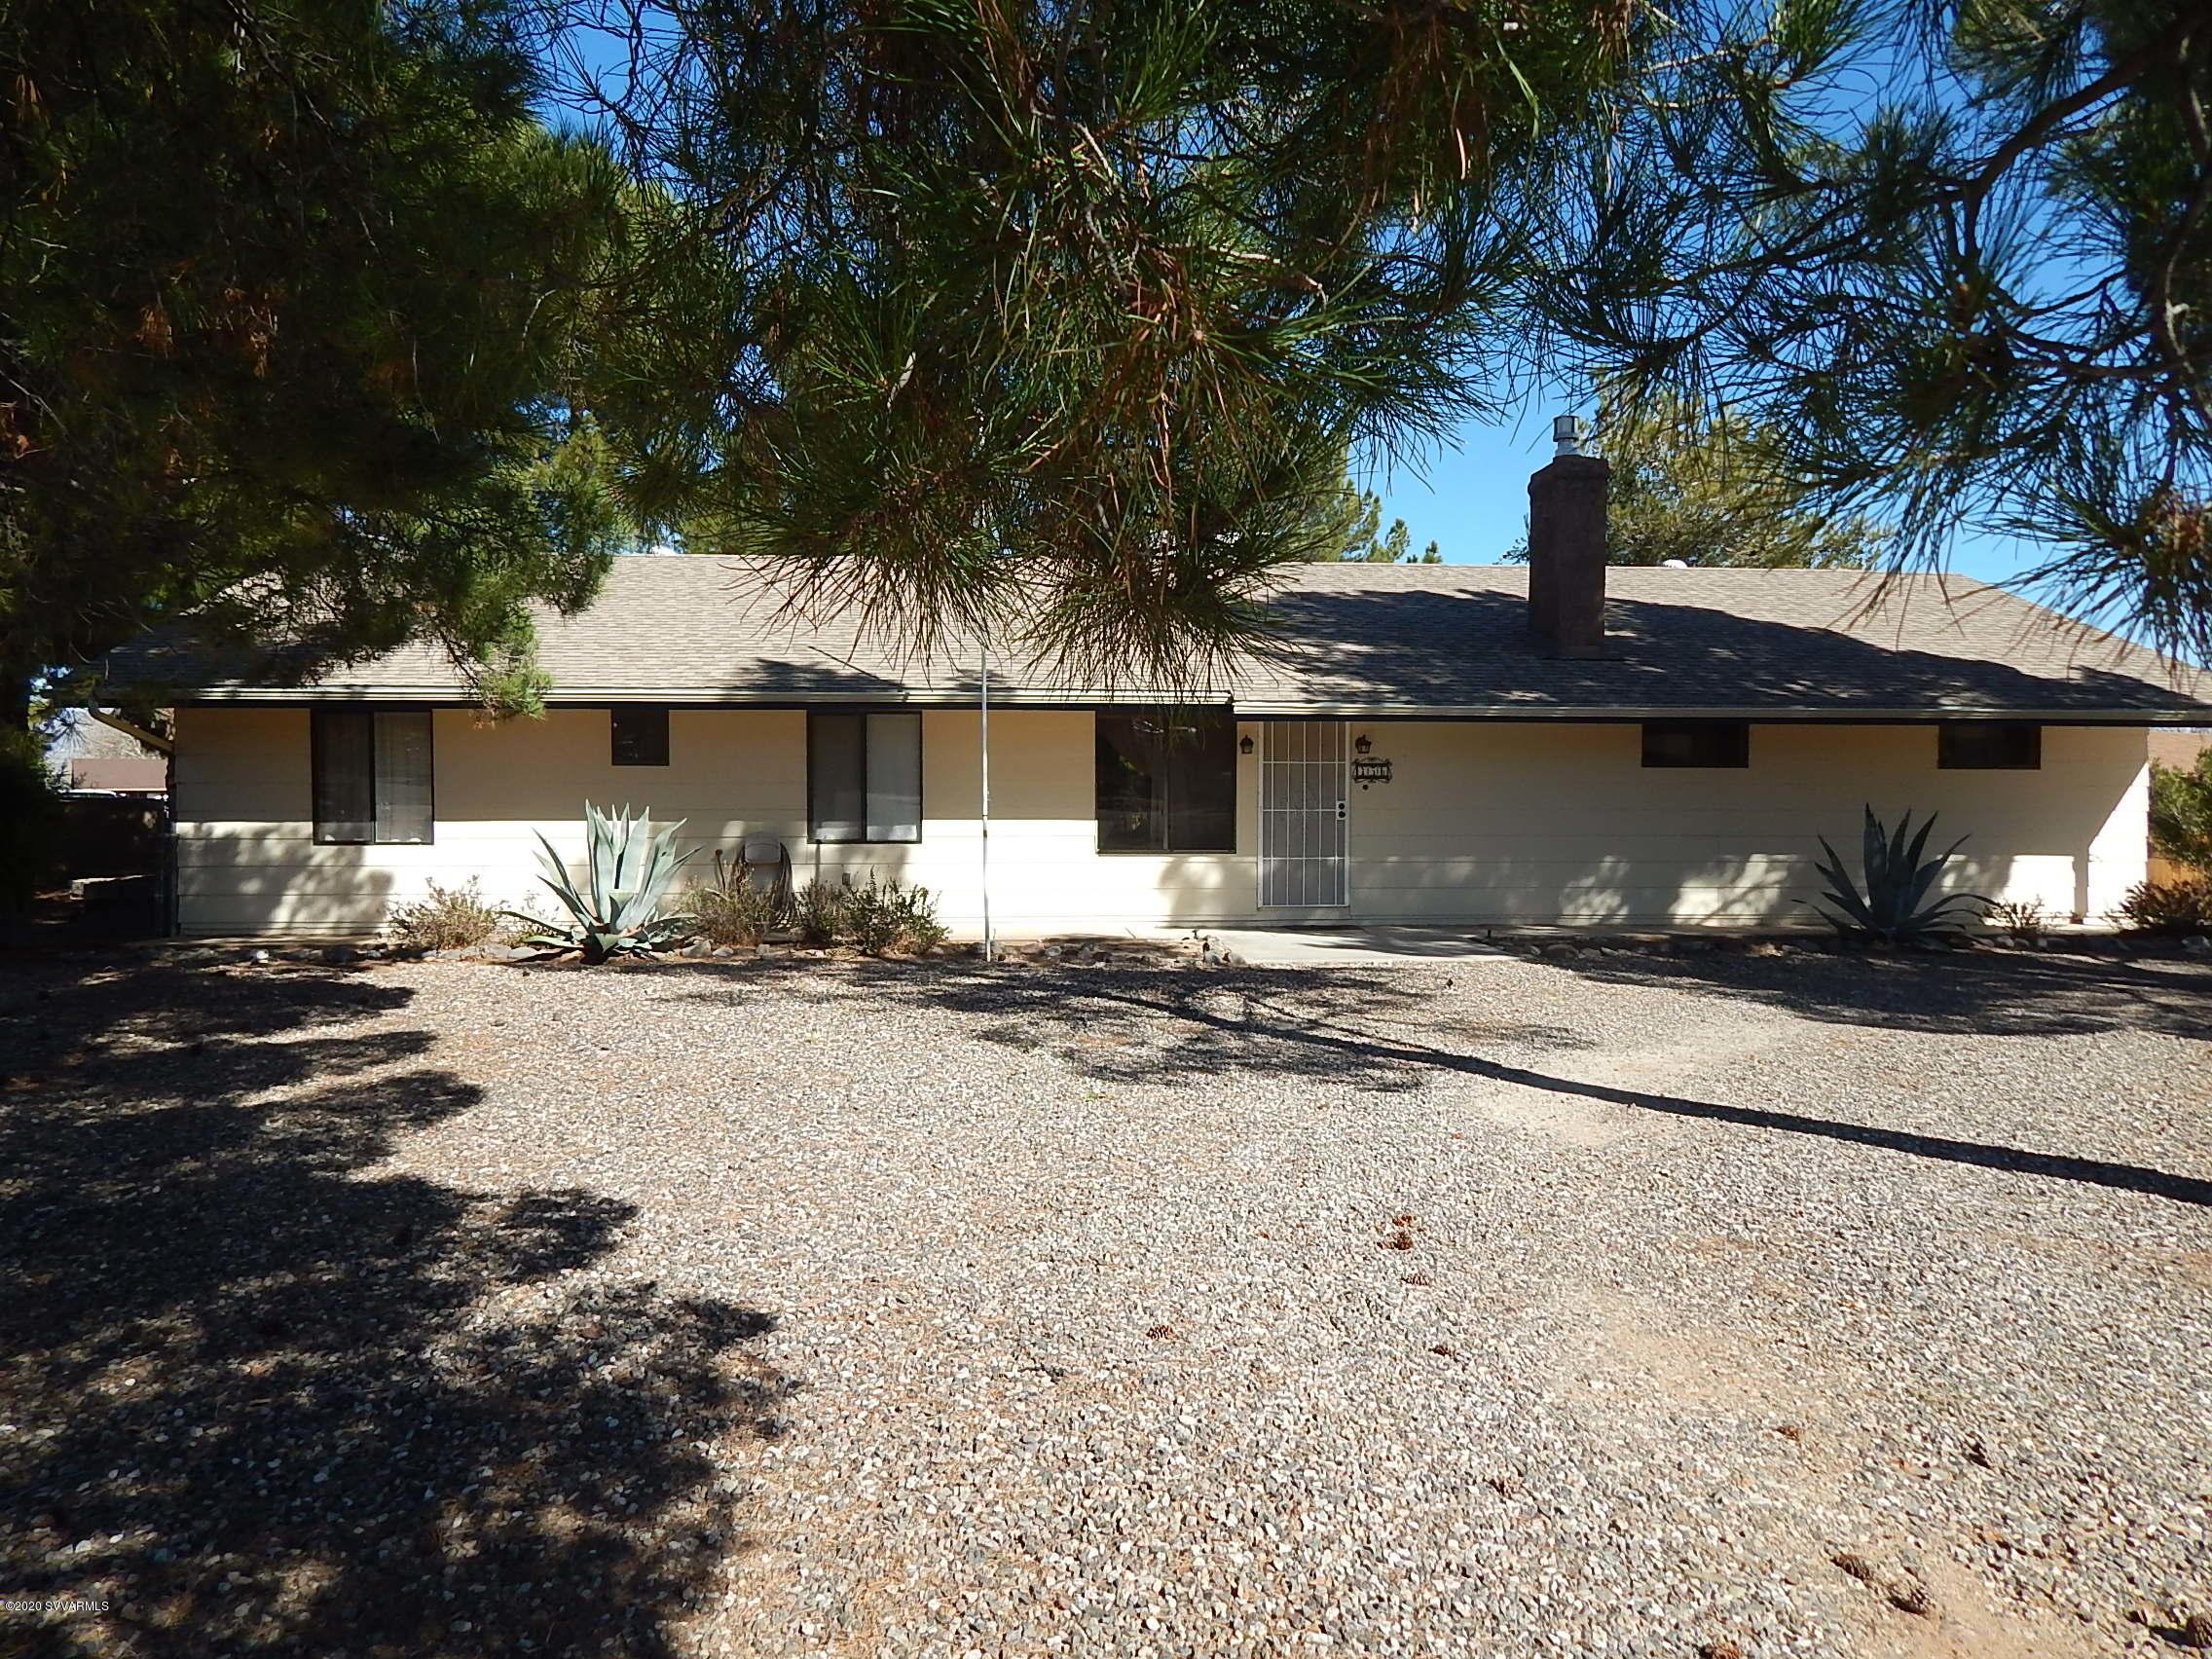 756 Bowmaker Tr Cottonwood, AZ 86326